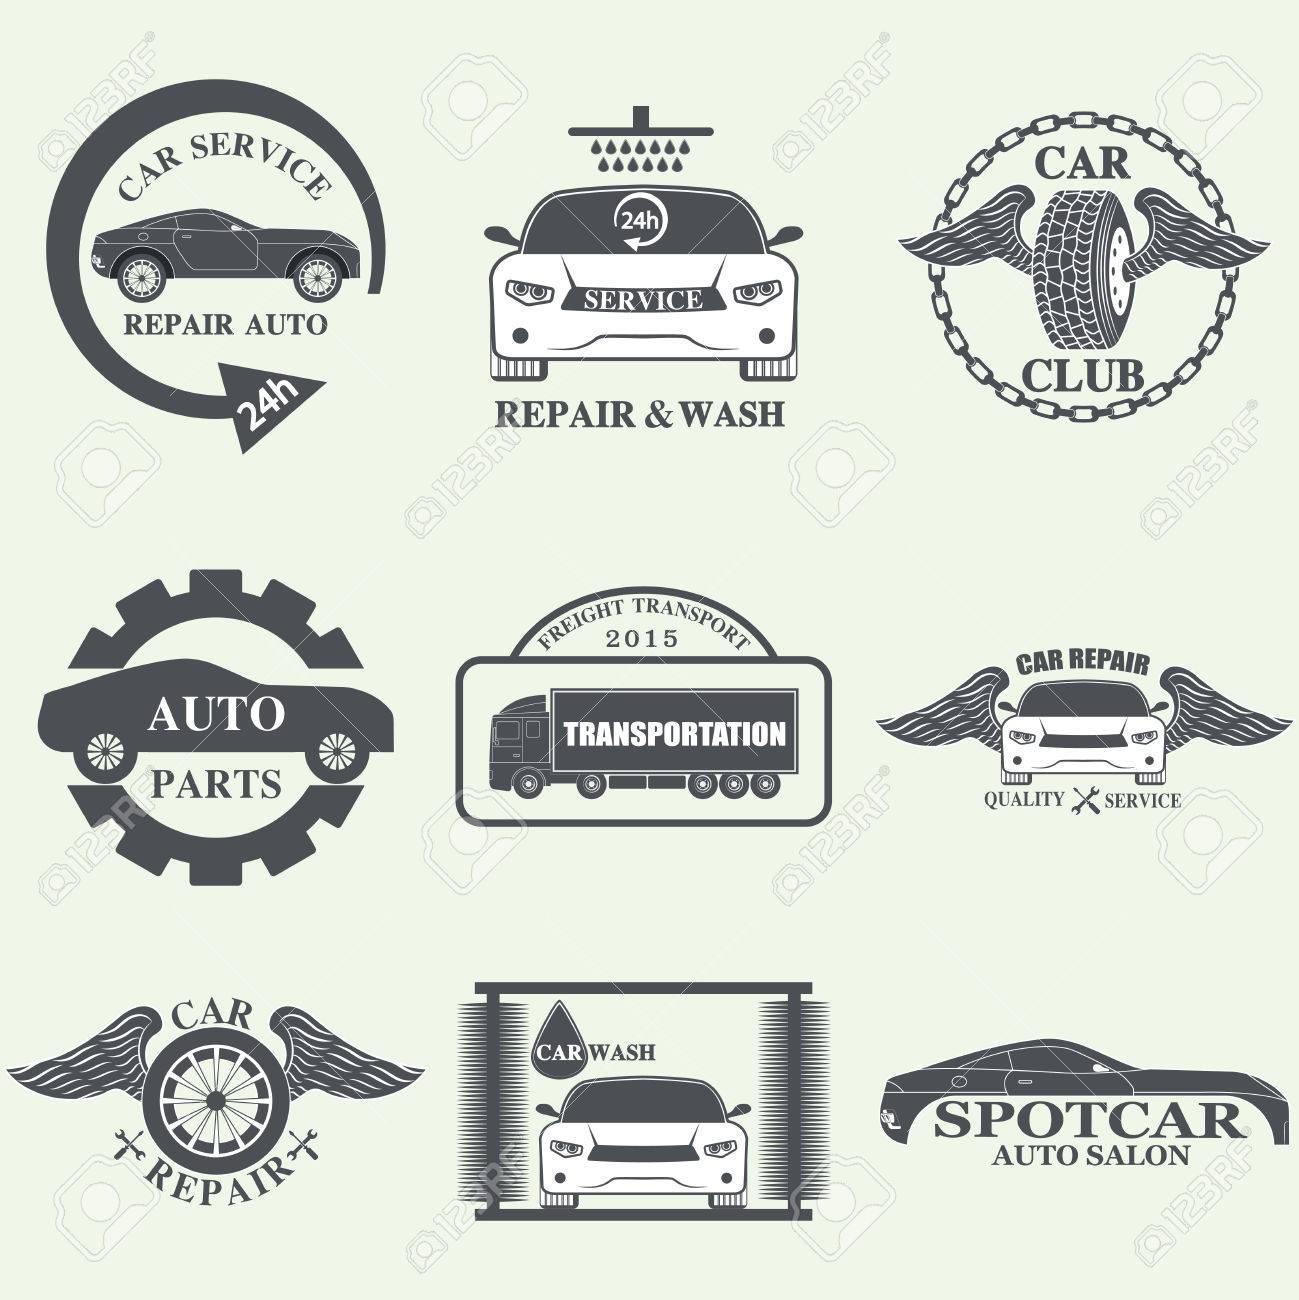 Set Of Car Service Labels, Emblems And Design Elements Royalty ...